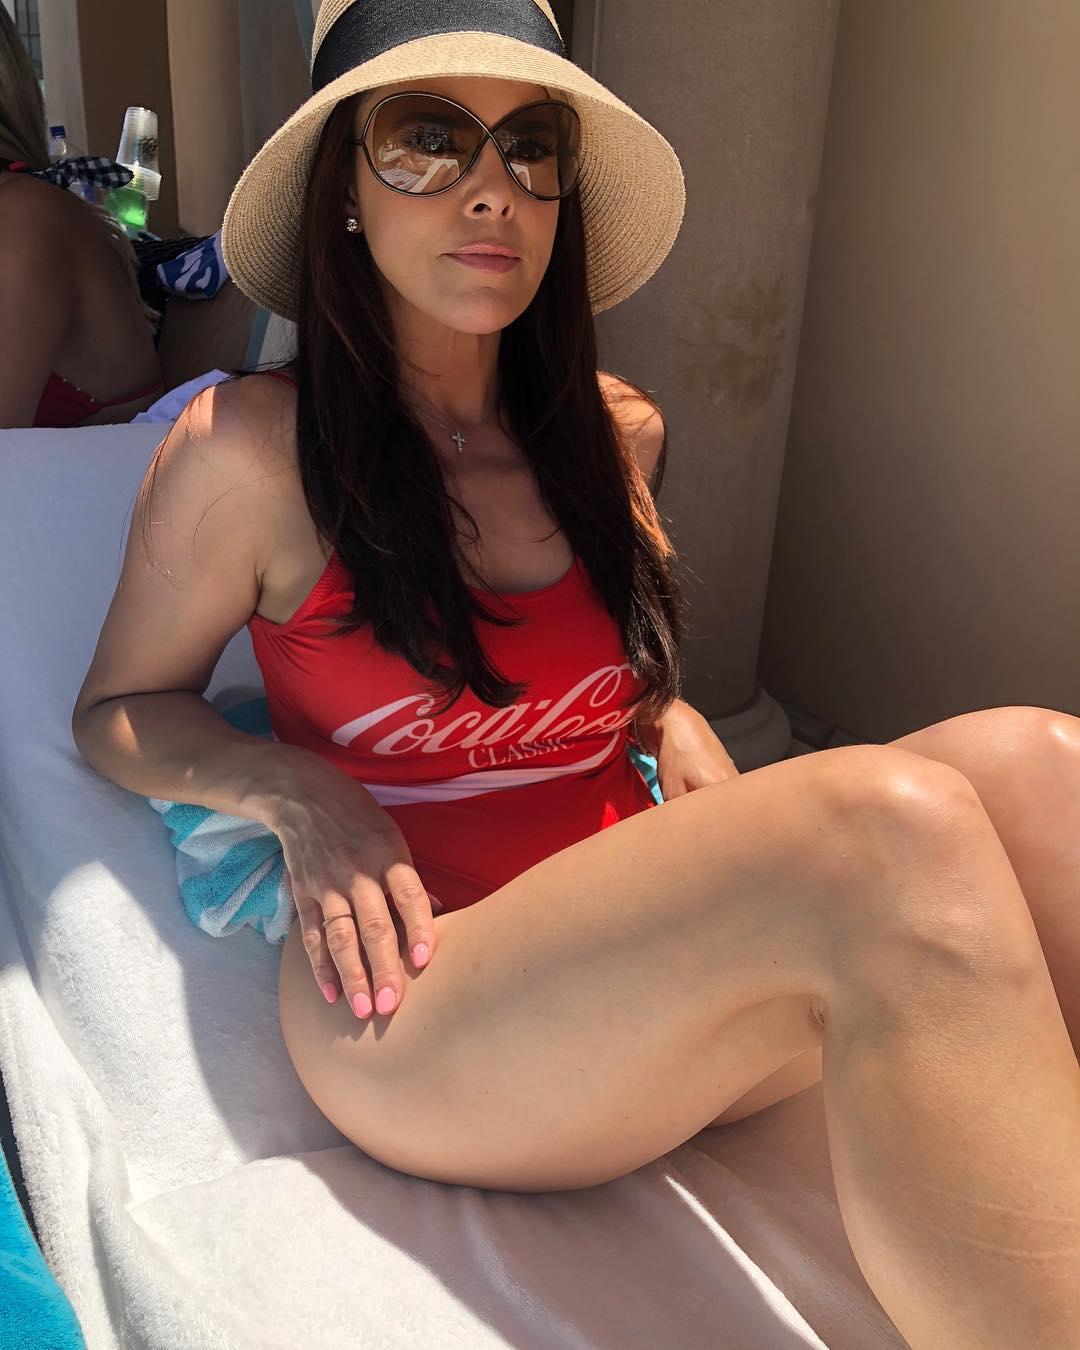 Rosa Blasi big thigh pics